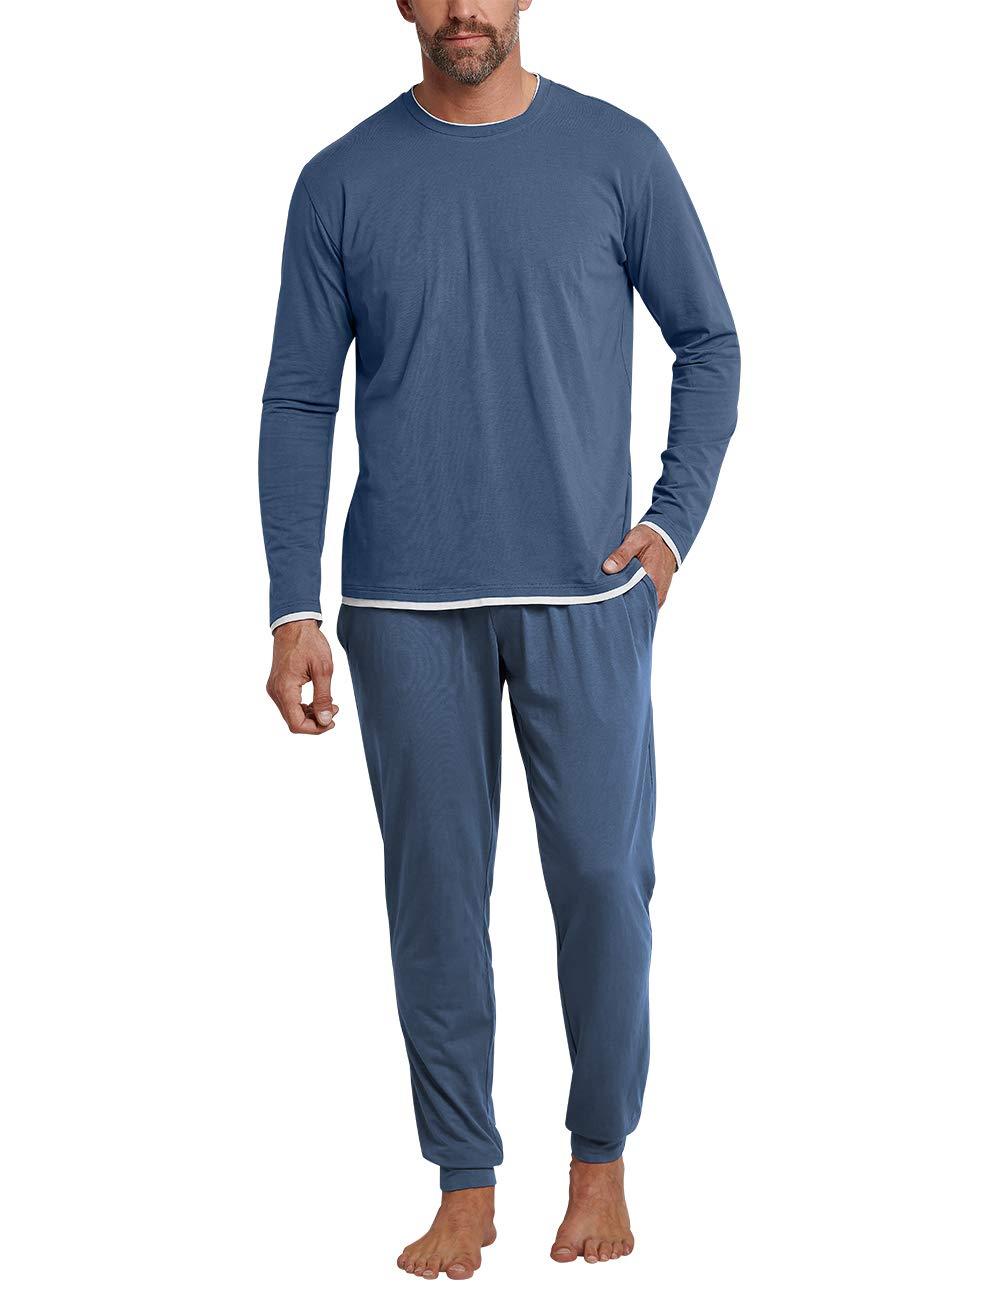 PyjamaBleuindigo Fabricant058Homme De 824Xxx Schlafanzug Ensemble largetaille Schiesser Lang QstrhCBodx